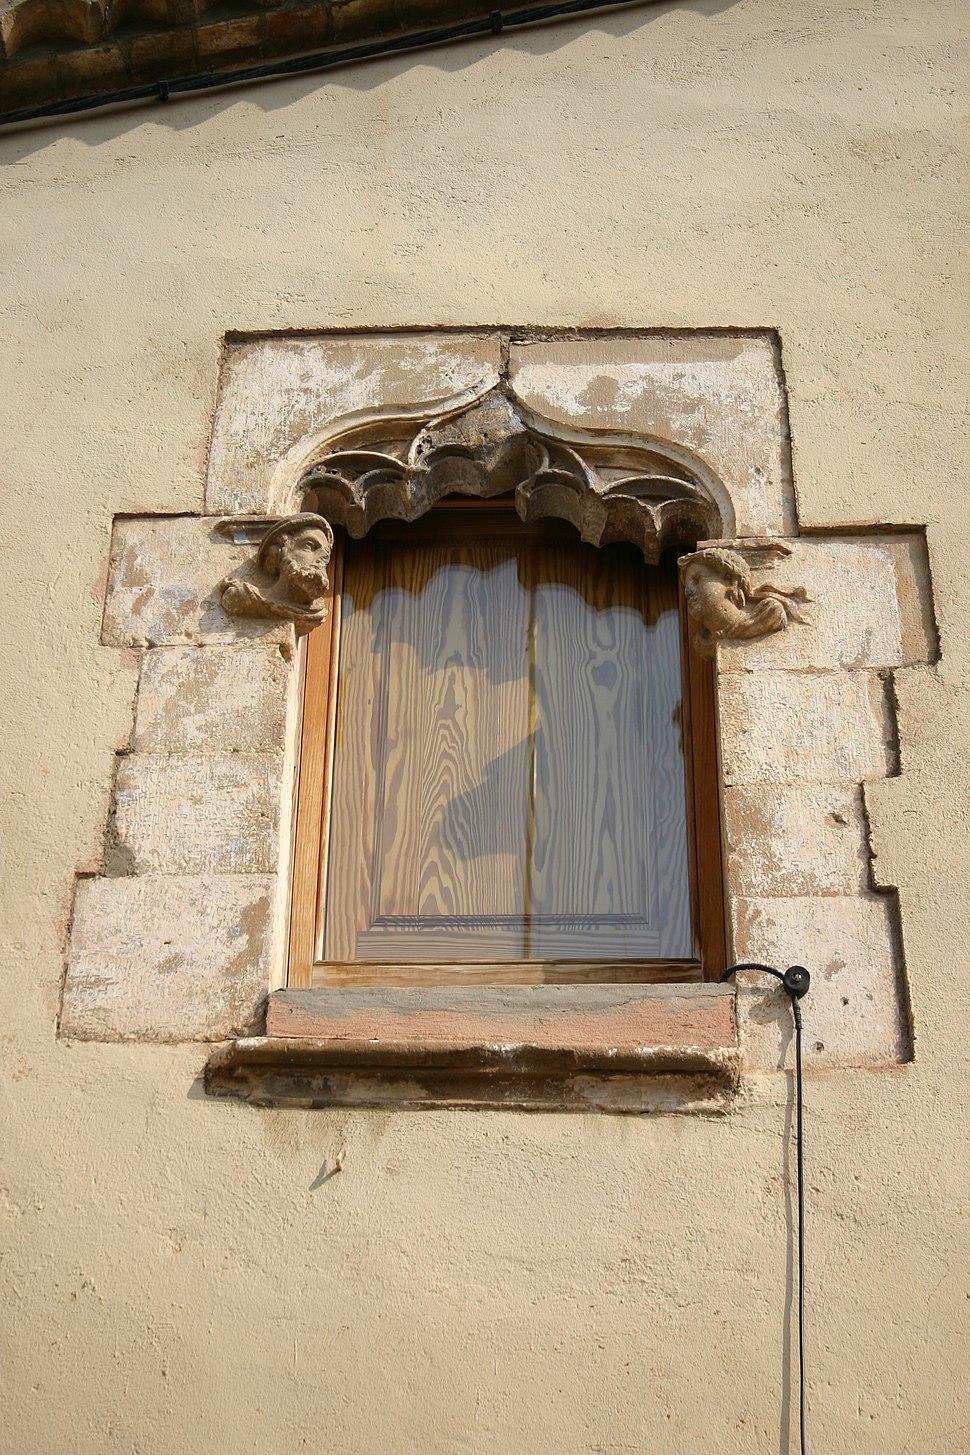 Spain.Hospitalet.Centre.Xipreret.finestrals.gotics.1.jpeg